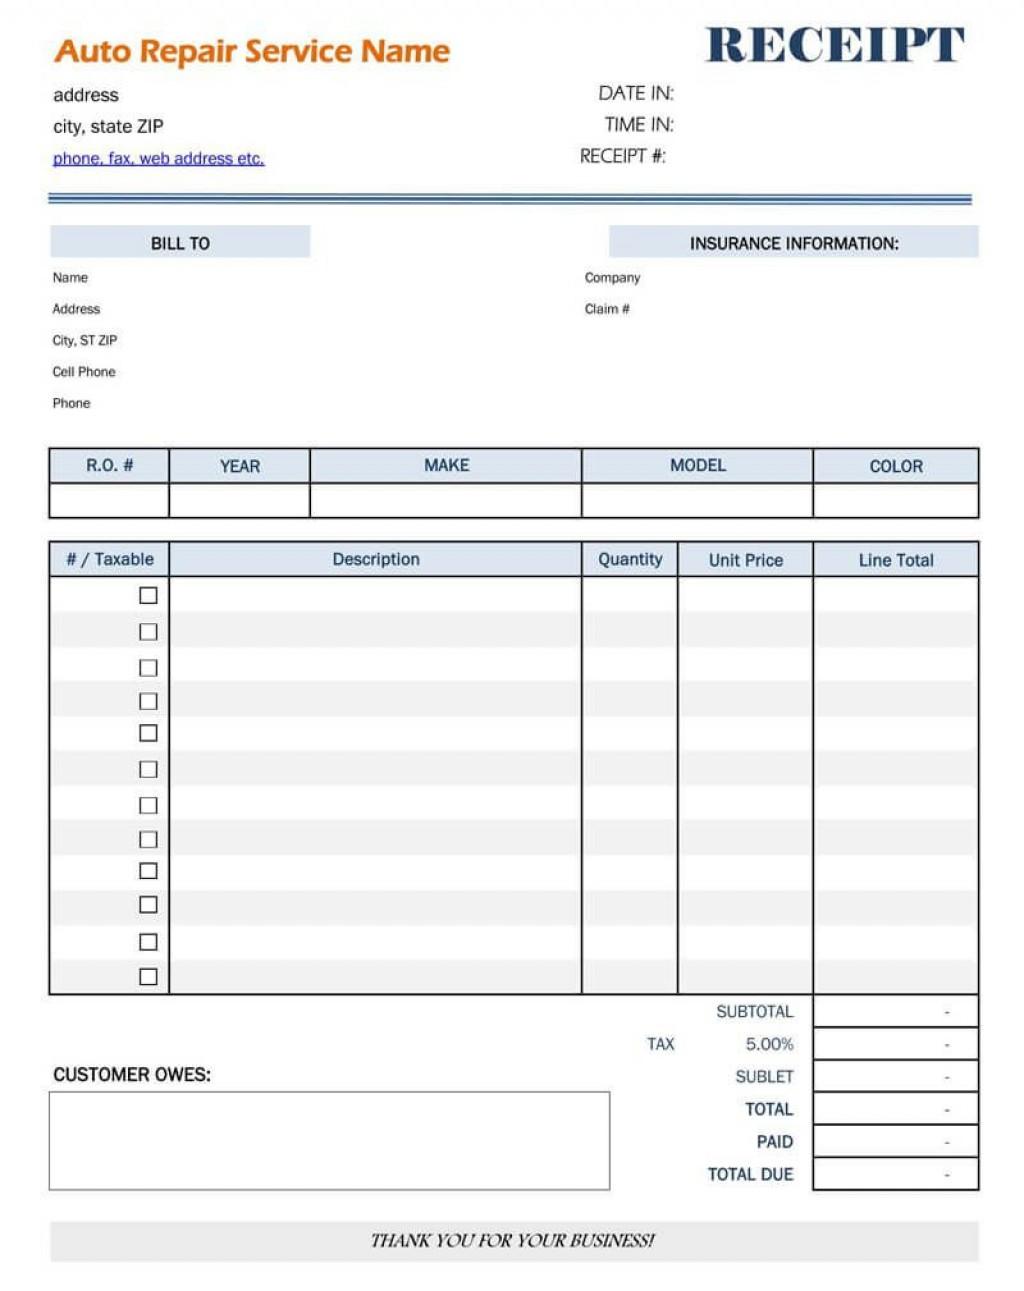 002 Unique Microsoft Word Auto Repair Invoice Template High Resolution Large